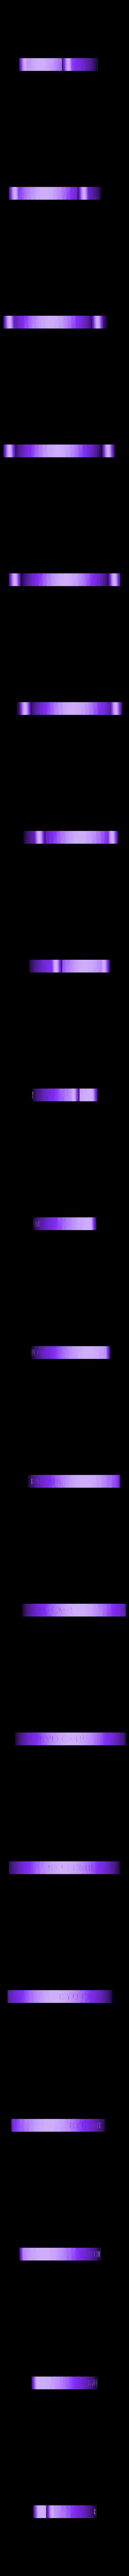 12holesBig.STL Download free STL file CurvedLinks: Large size circular links (LEGO Compatible) • 3D printing template, byucmr